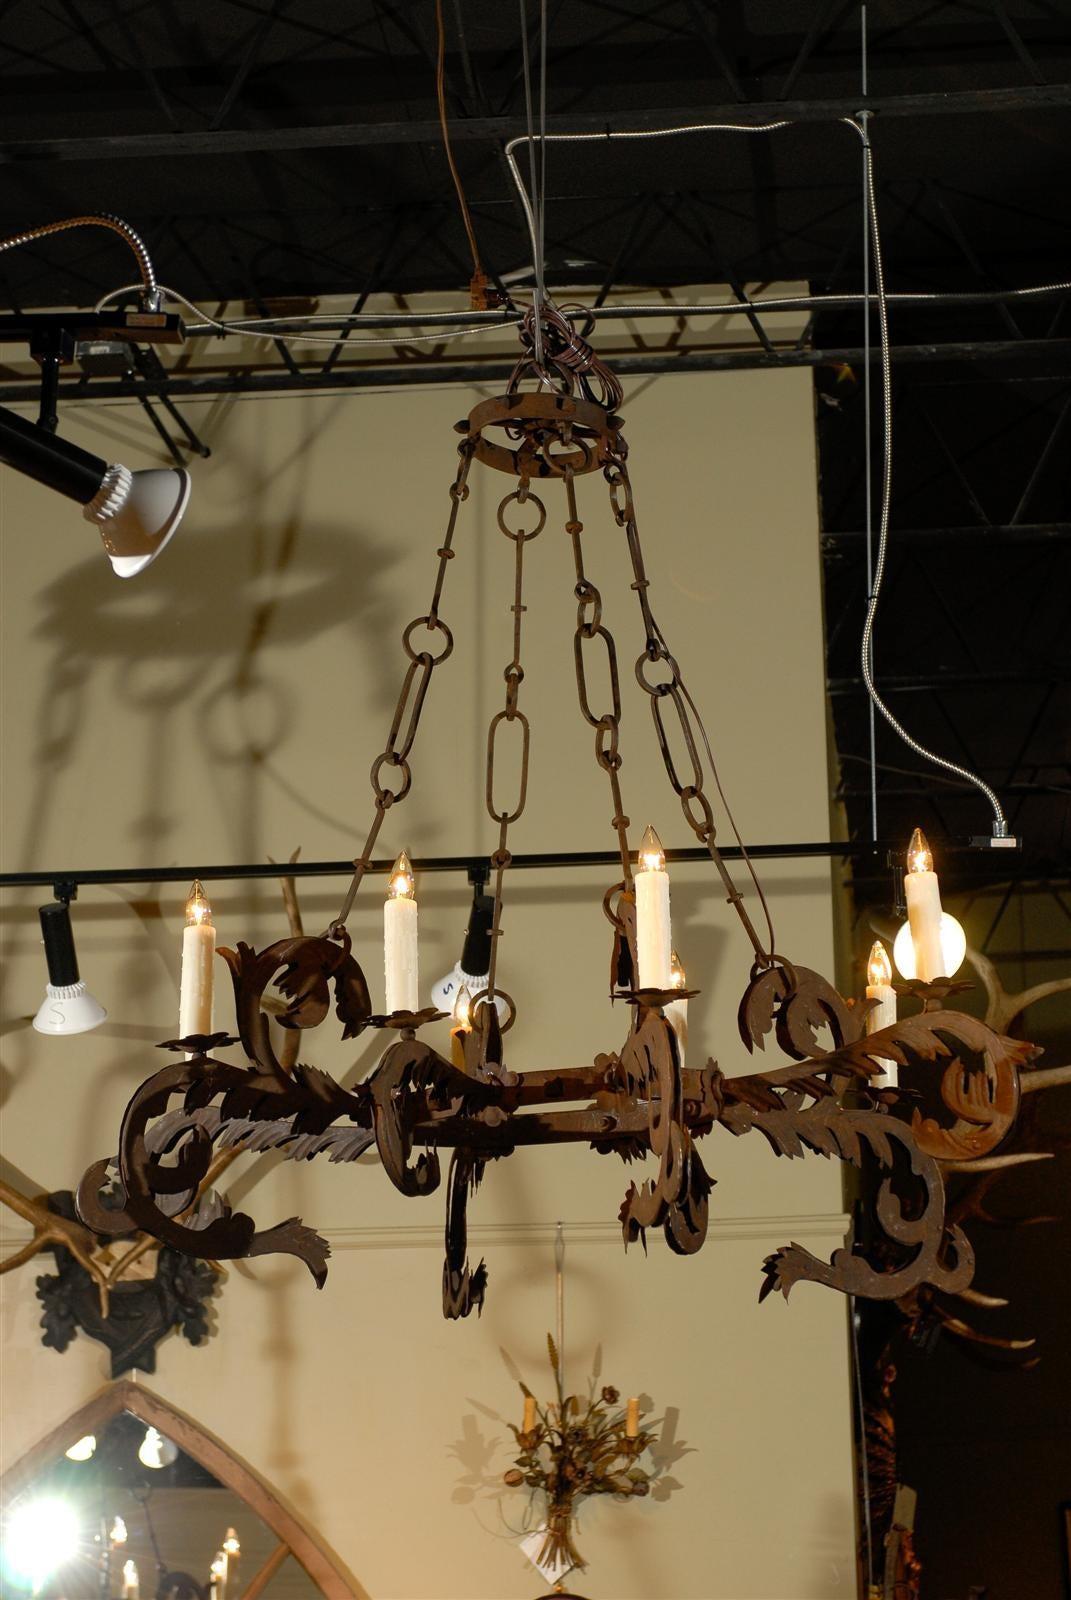 Pair of florentine 1720s gothic revival eight light wrought iron a pair of florentine early 18h century eight light gothic revival wrought iron chandeliers arubaitofo Choice Image